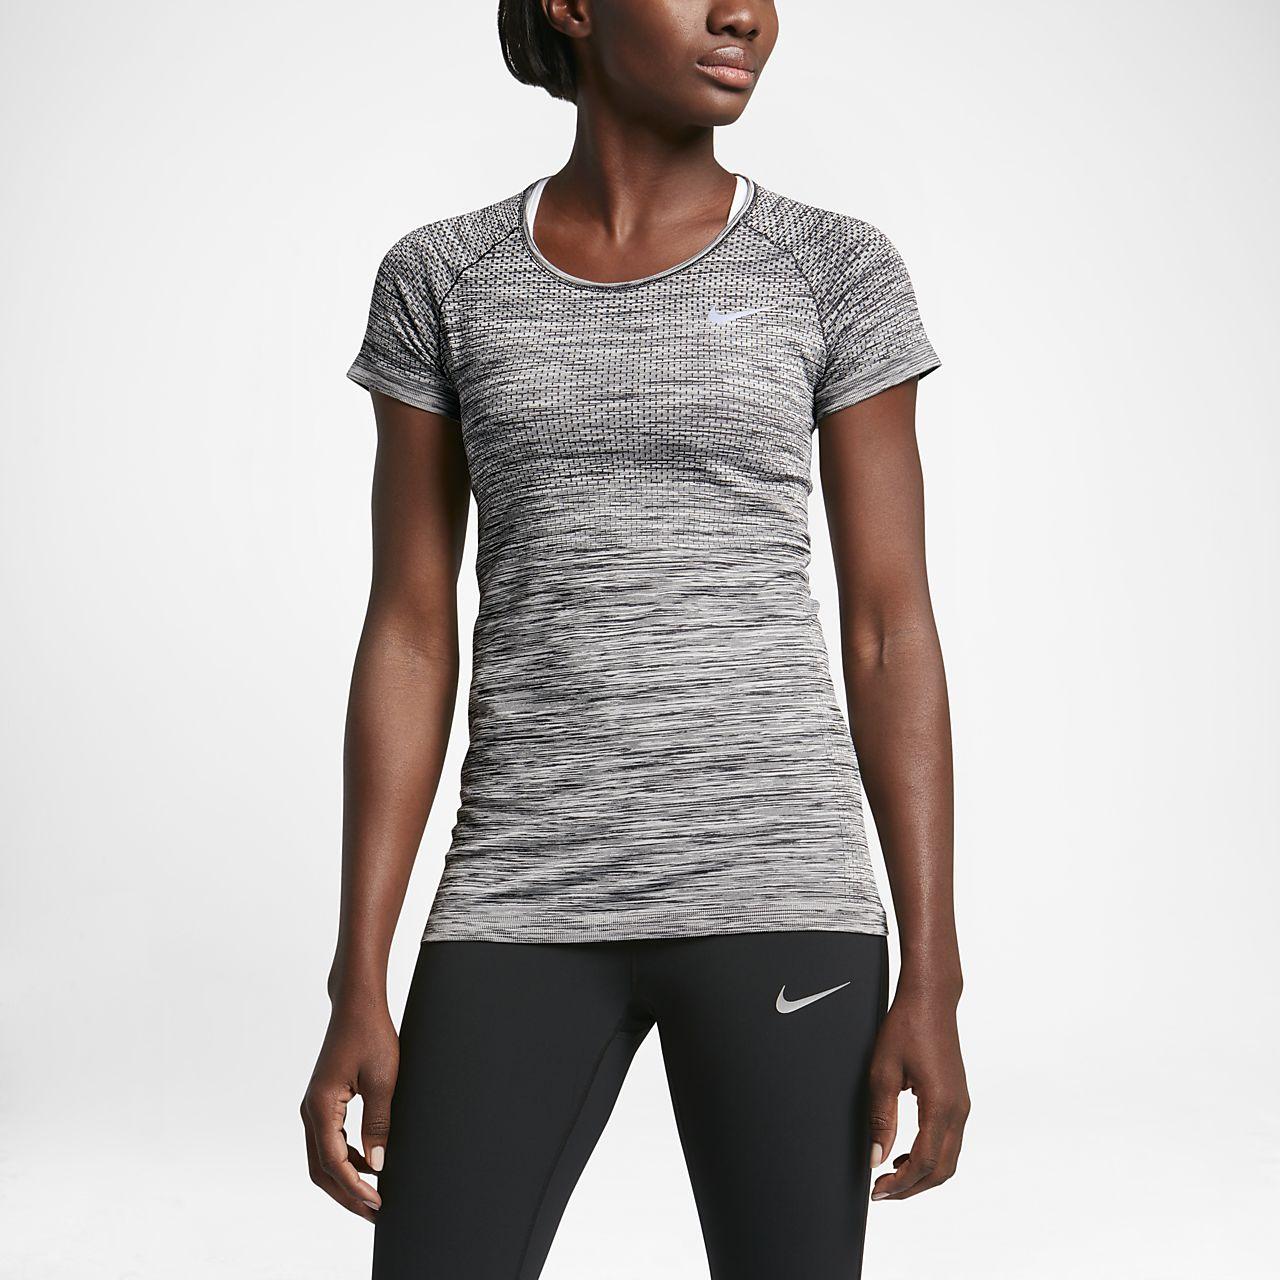 f20c6299dcf62 Nike Dri-FIT Knit Camiseta de running de manga corta - Mujer. Nike ...